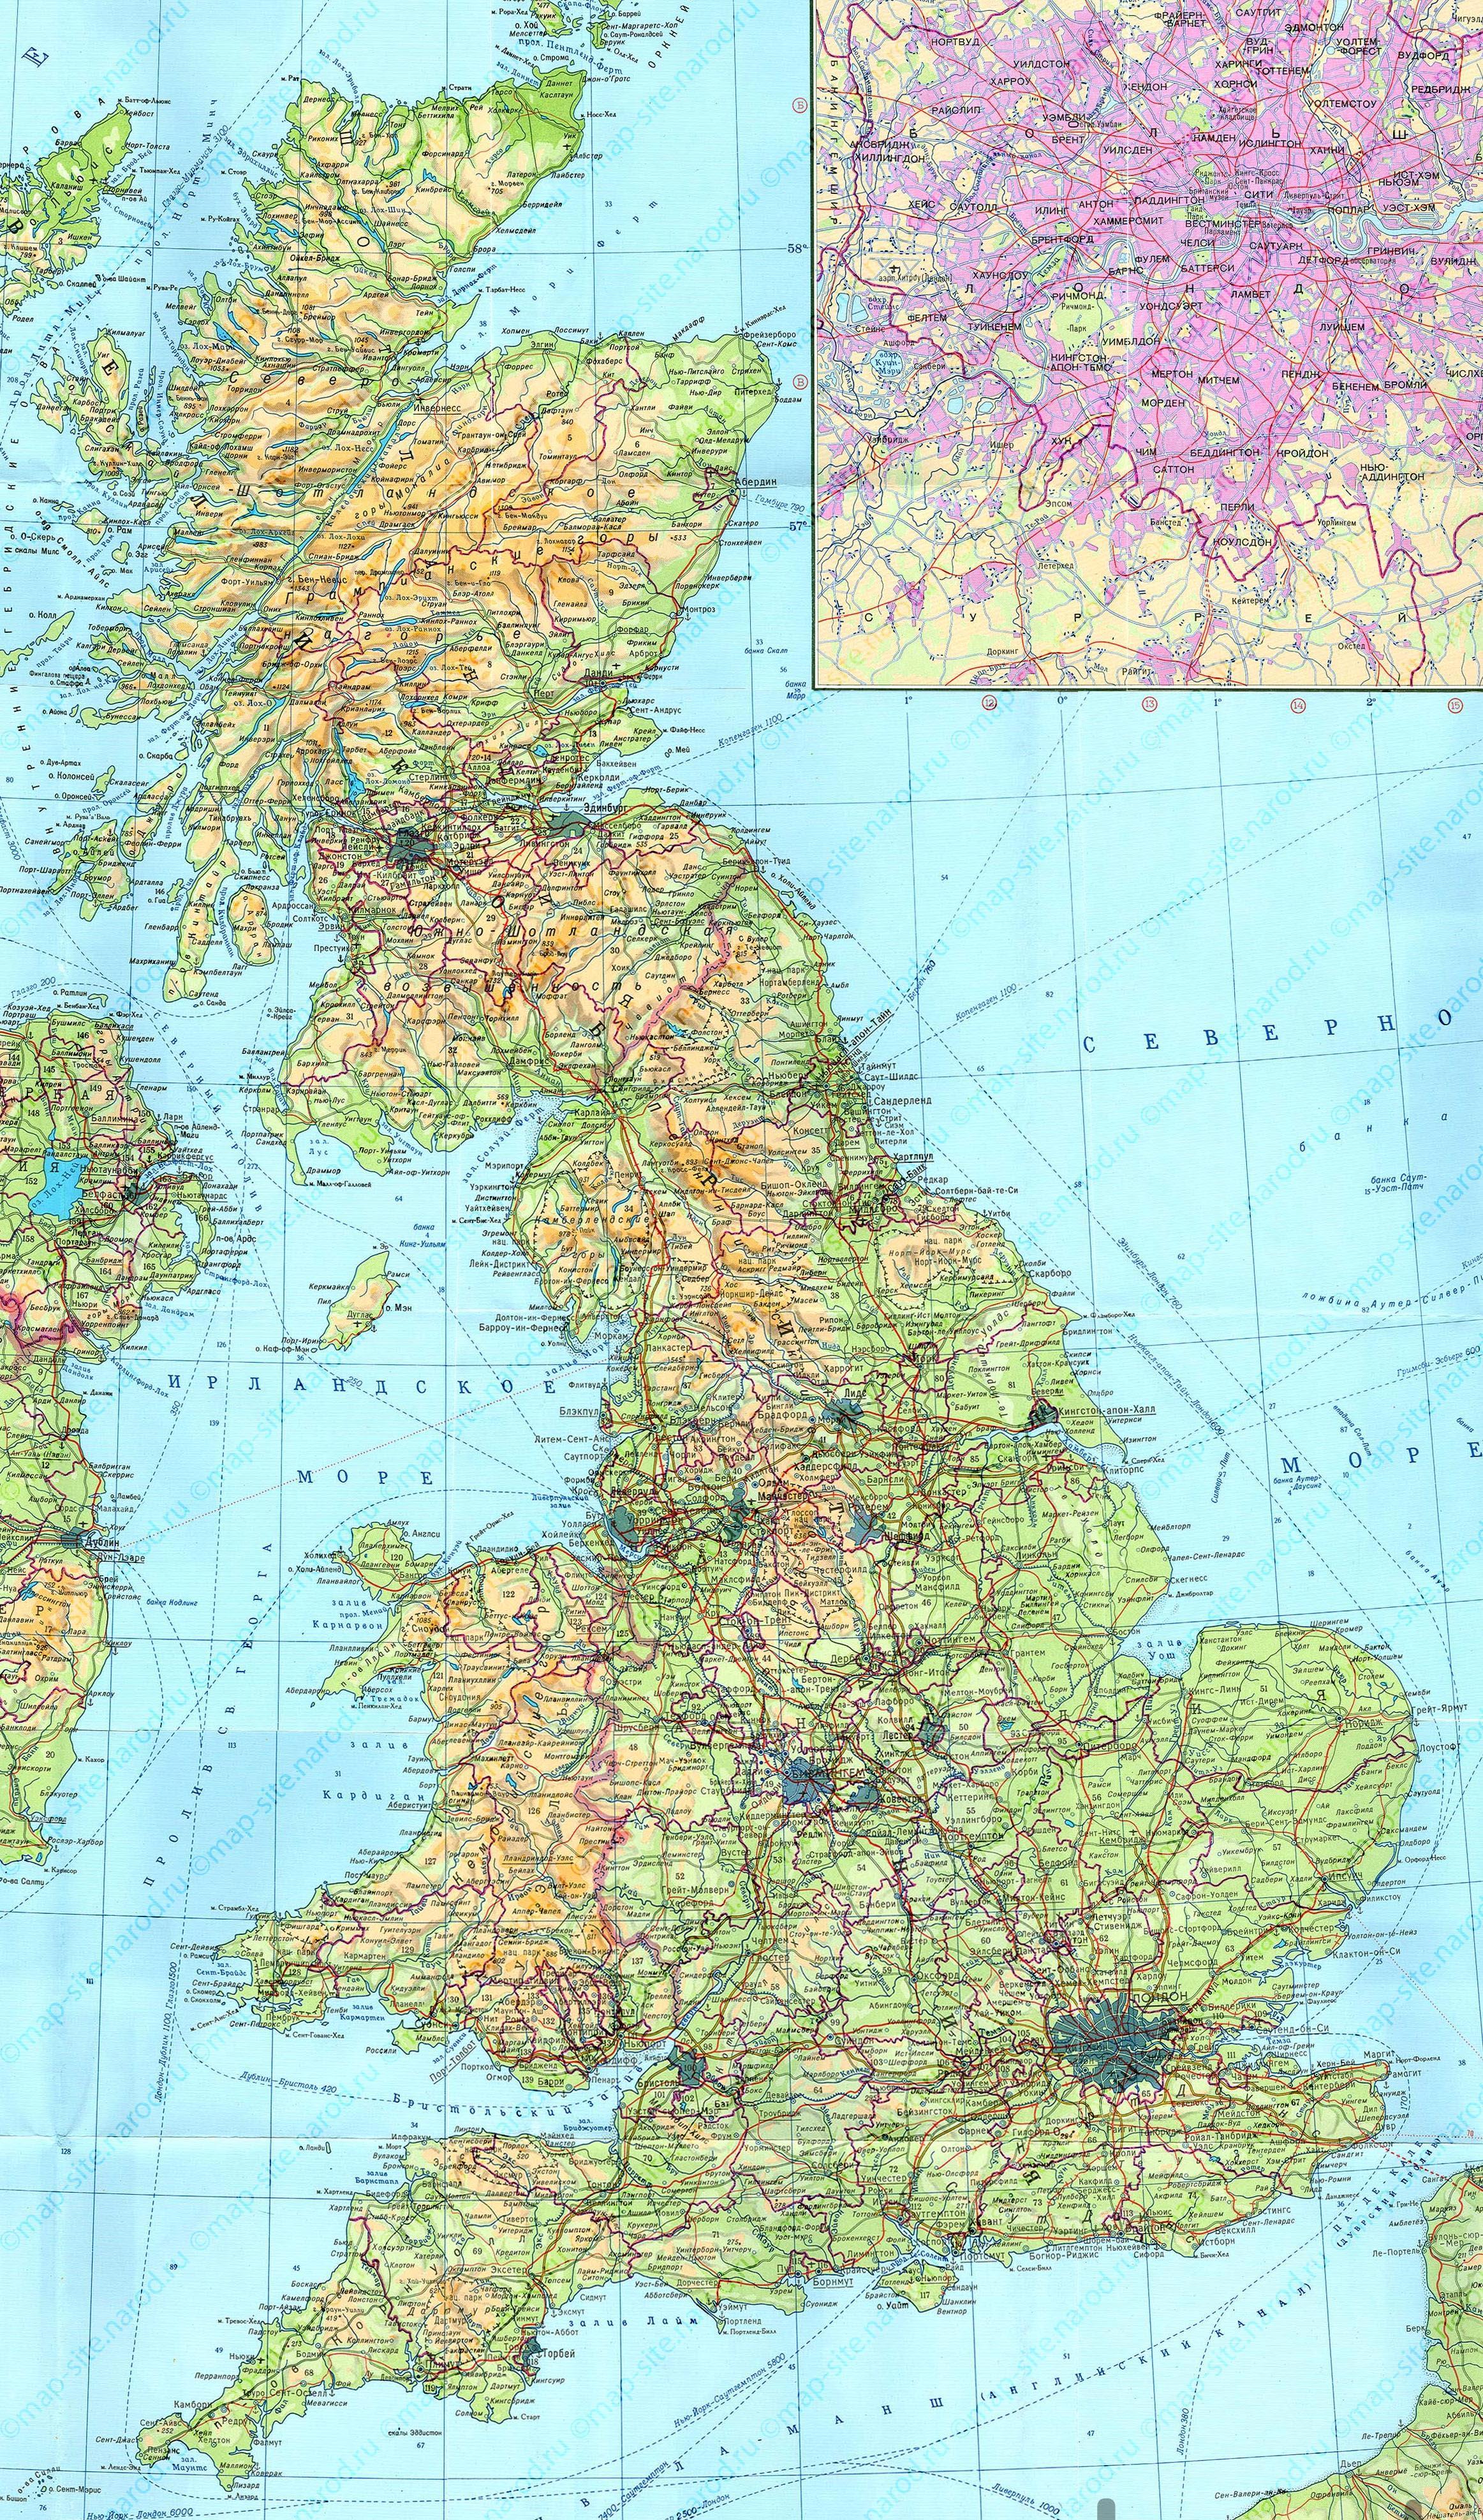 2325 3950 карта острова великобритания